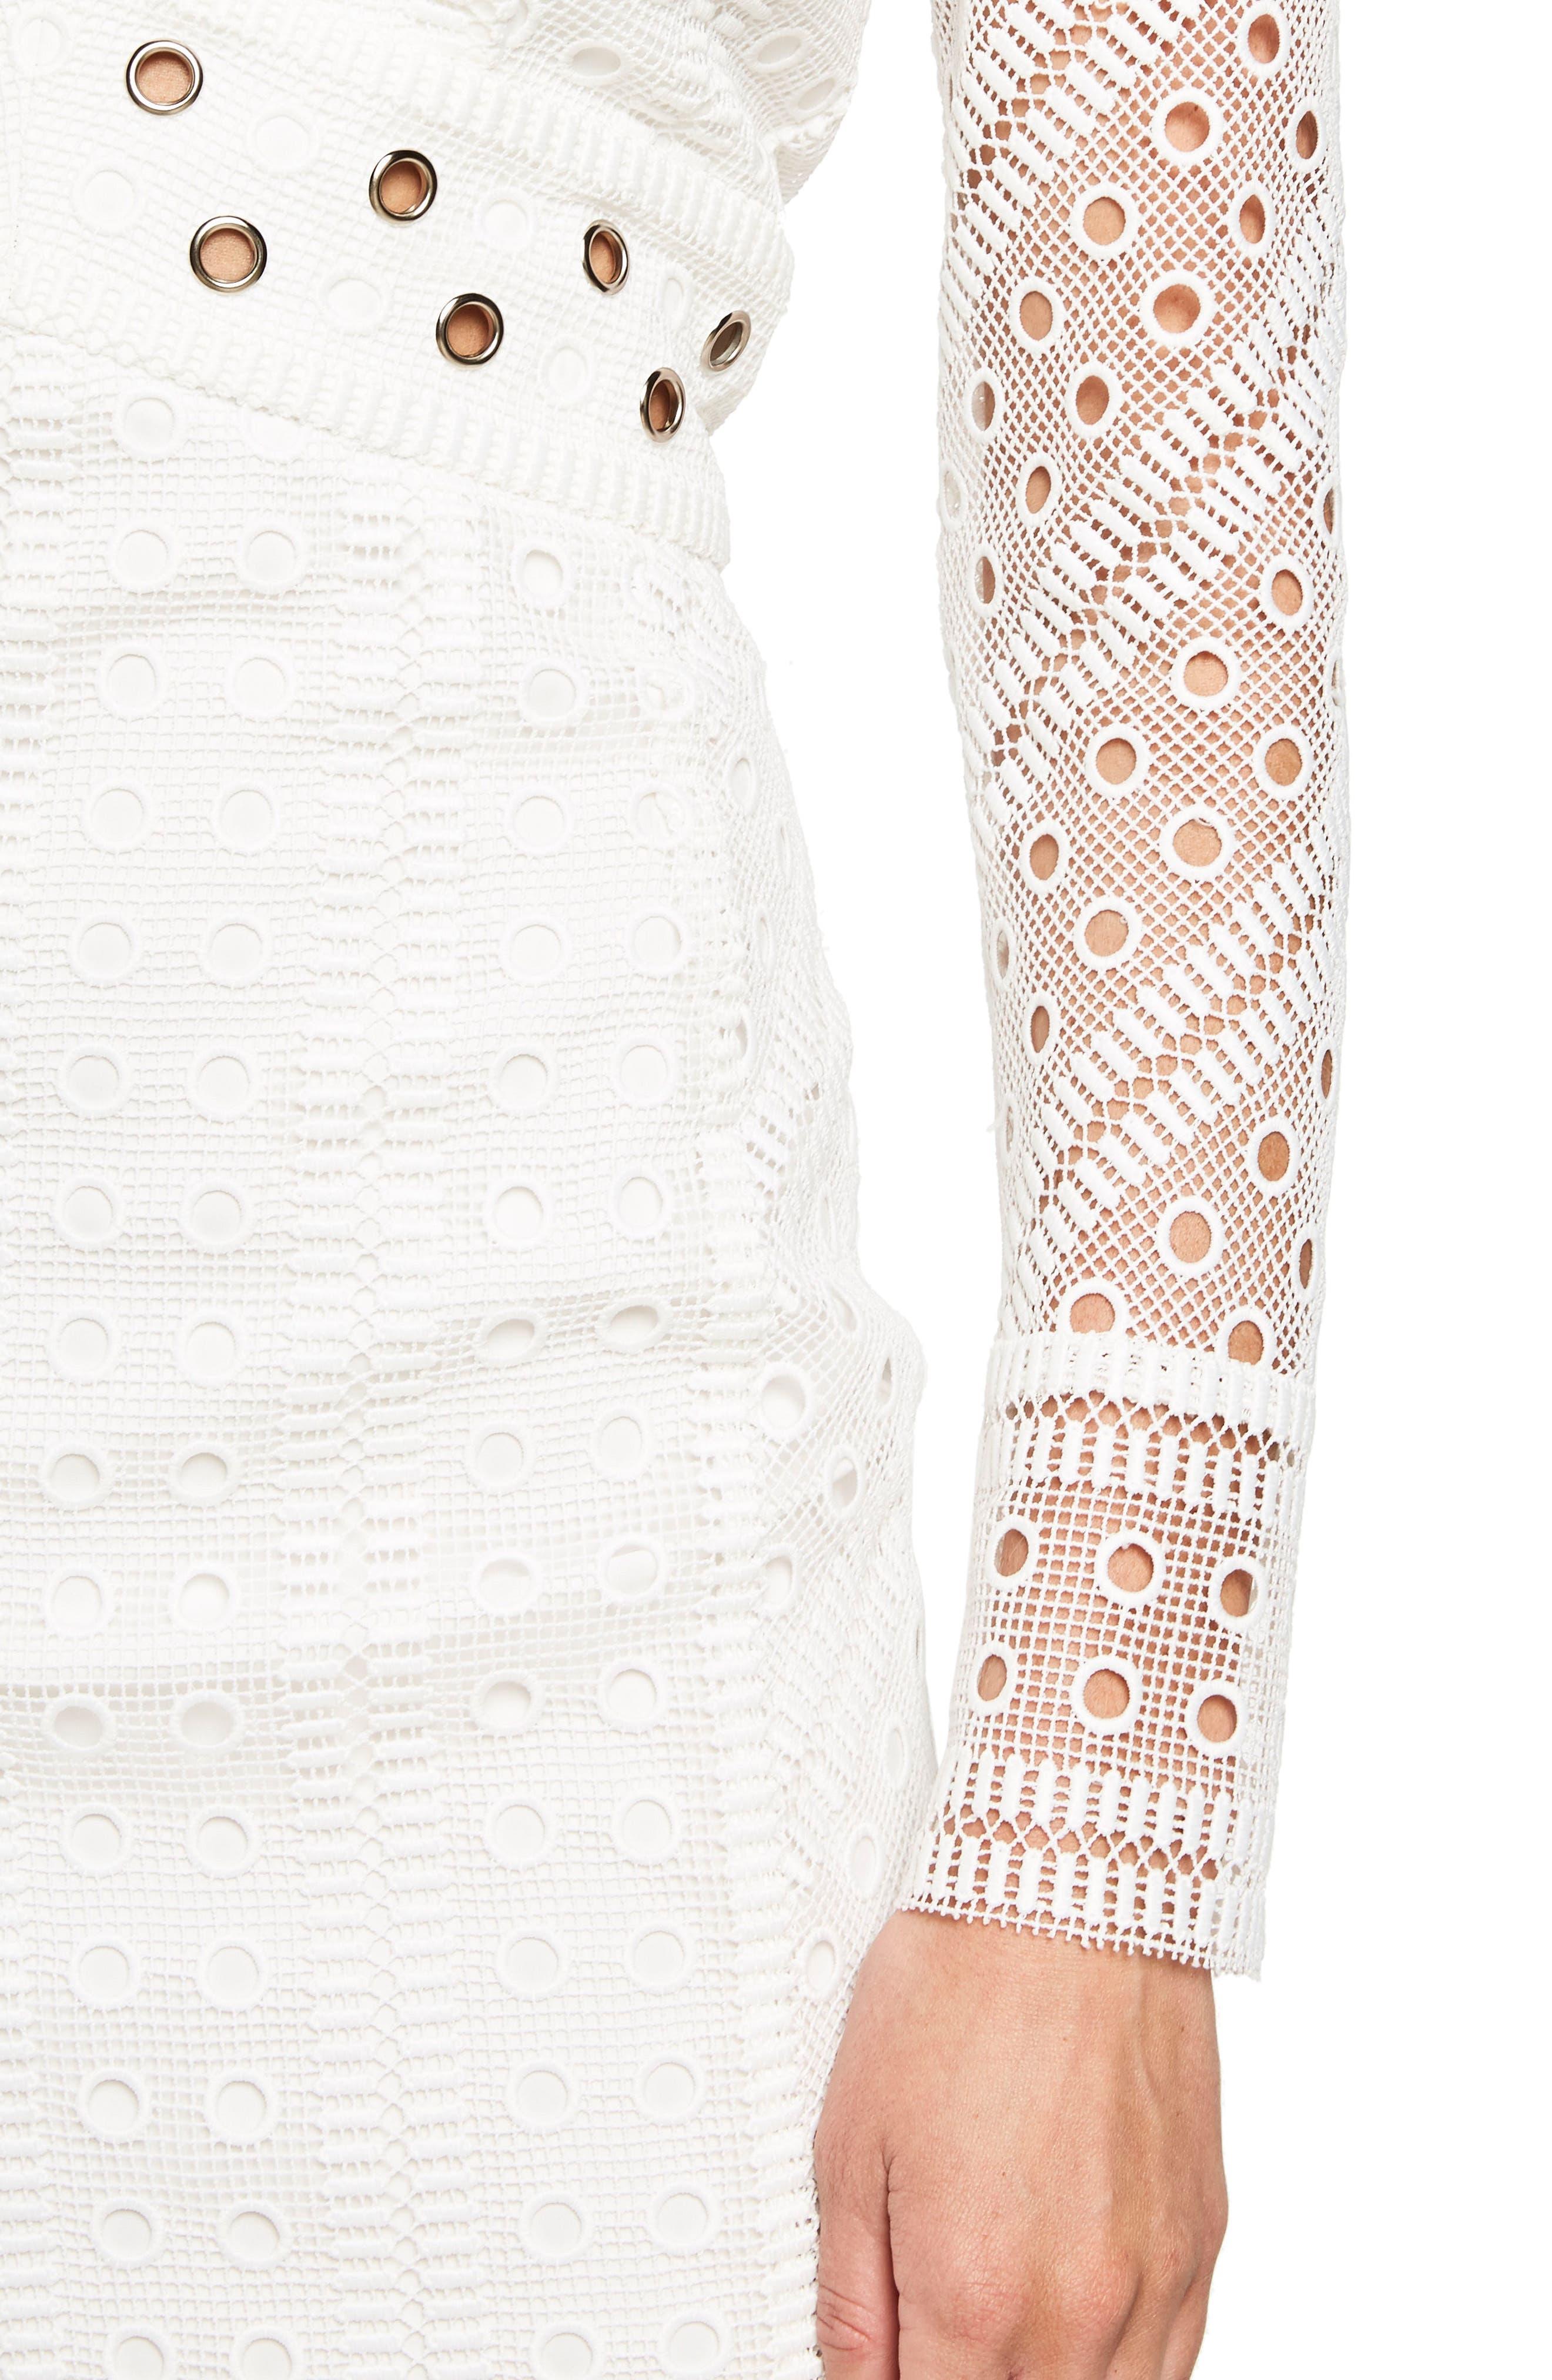 Grommet Detail Broderie Anglaise Dress,                             Alternate thumbnail 4, color,                             900